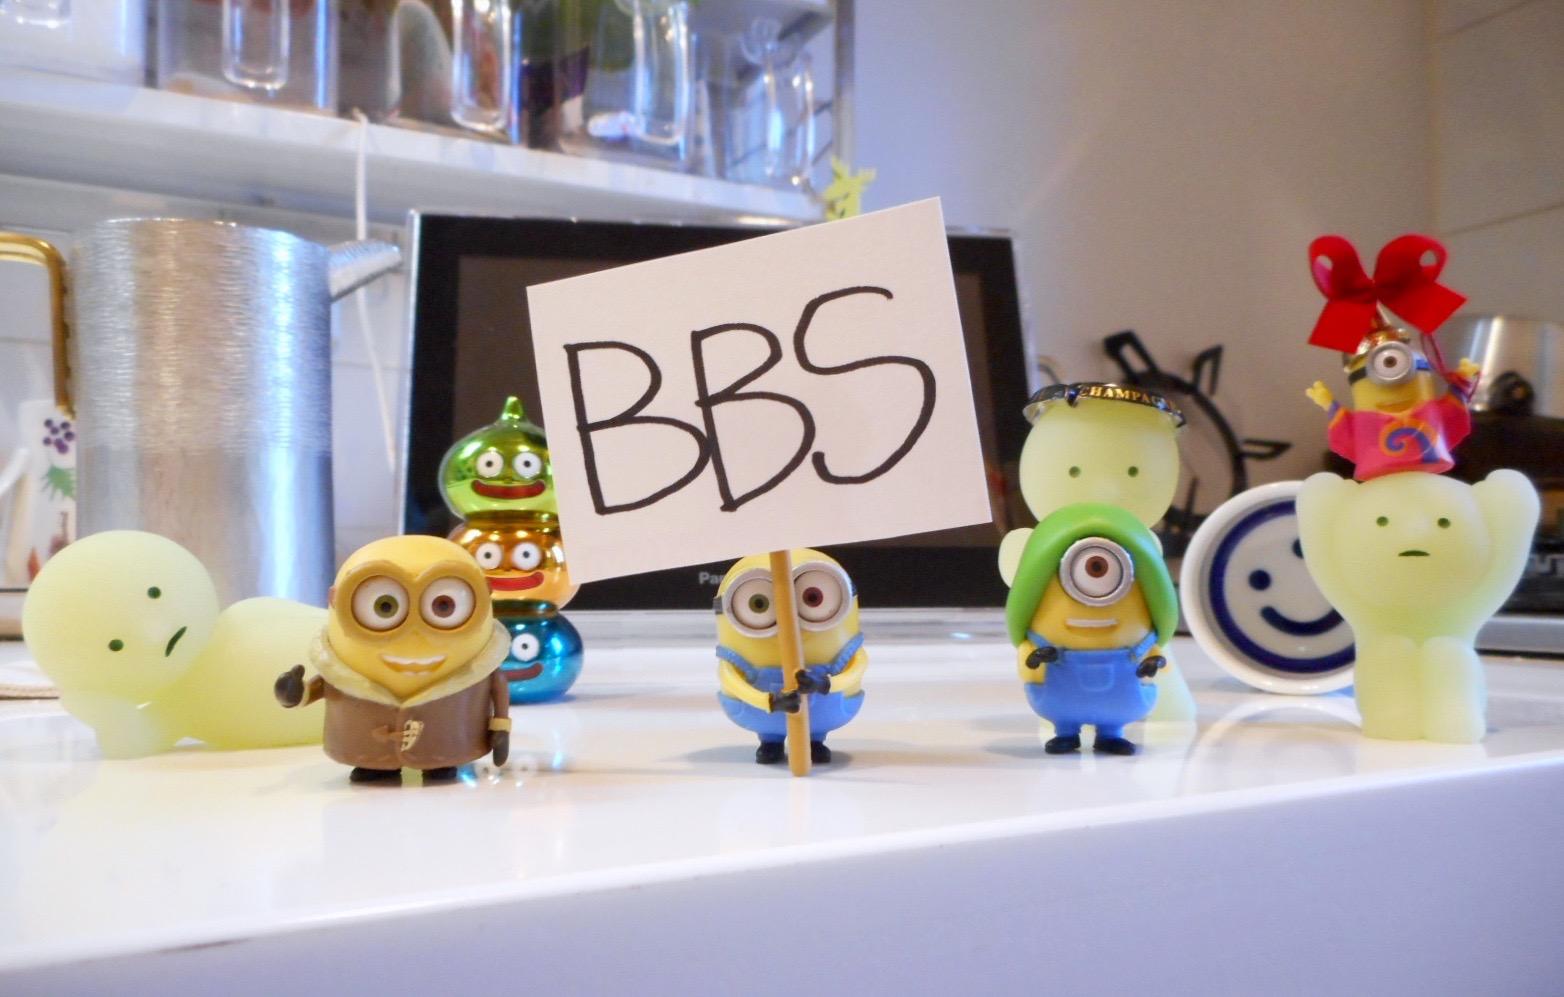 bbs1.jpg